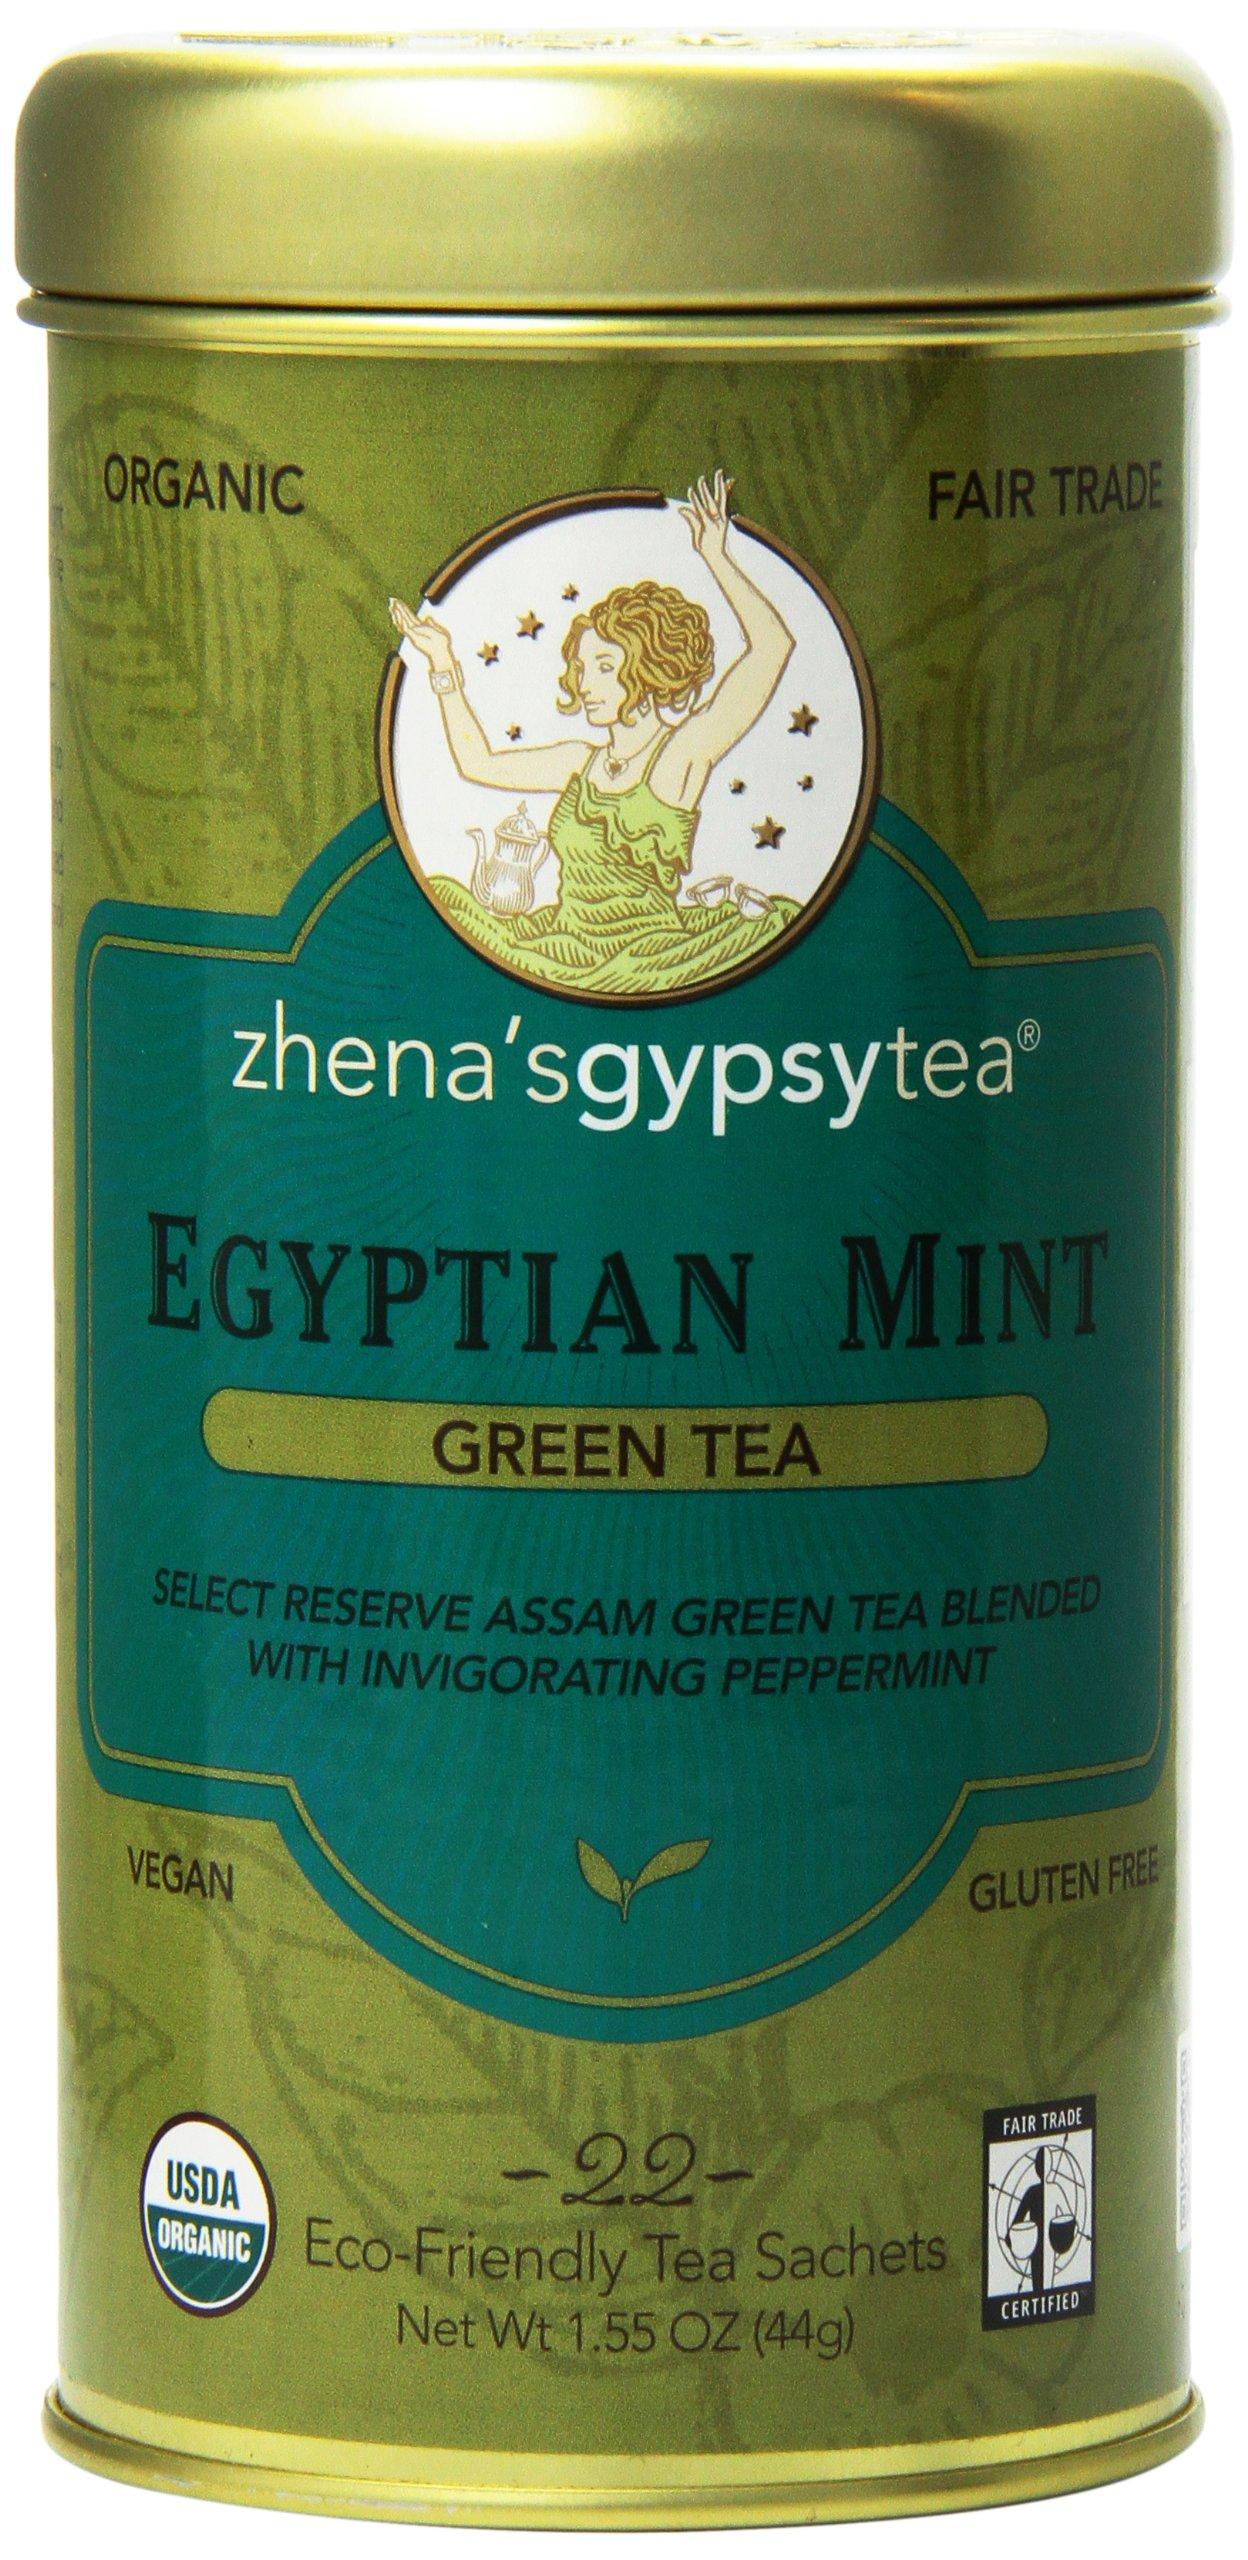 Zhena's Gypsy Tea, Egyptian Mint, 22 Count Tea Sachets